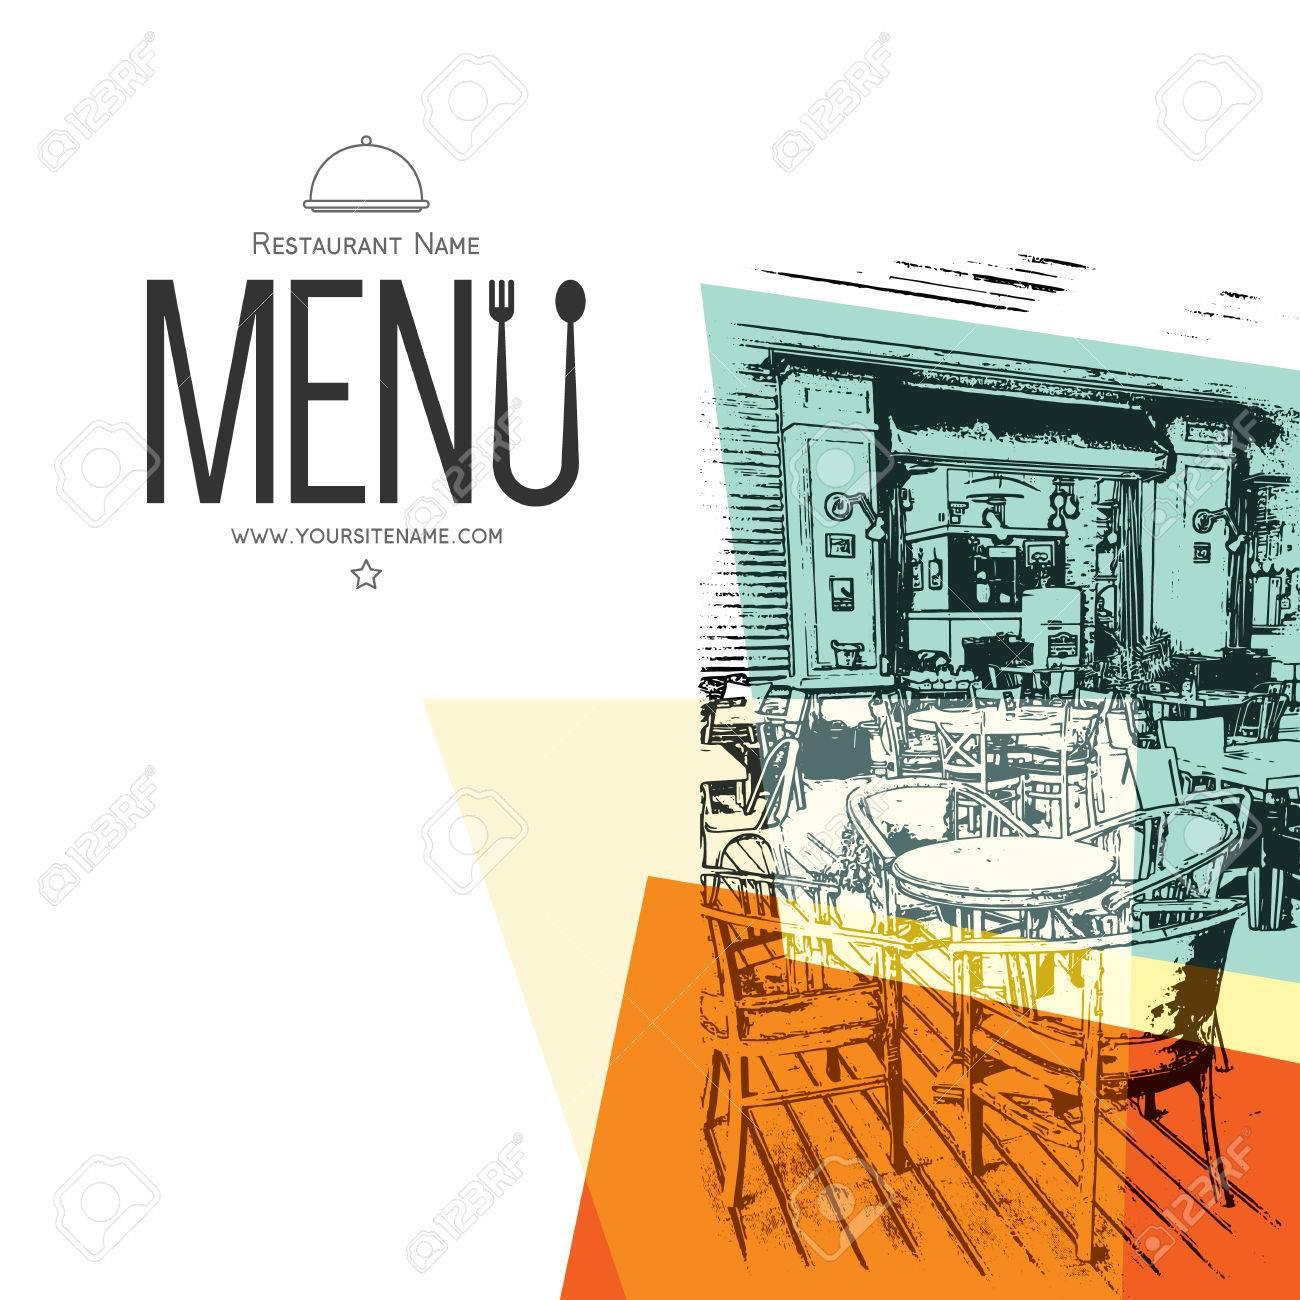 Retro restaurant menu design. With a sketch pictures - 54504882